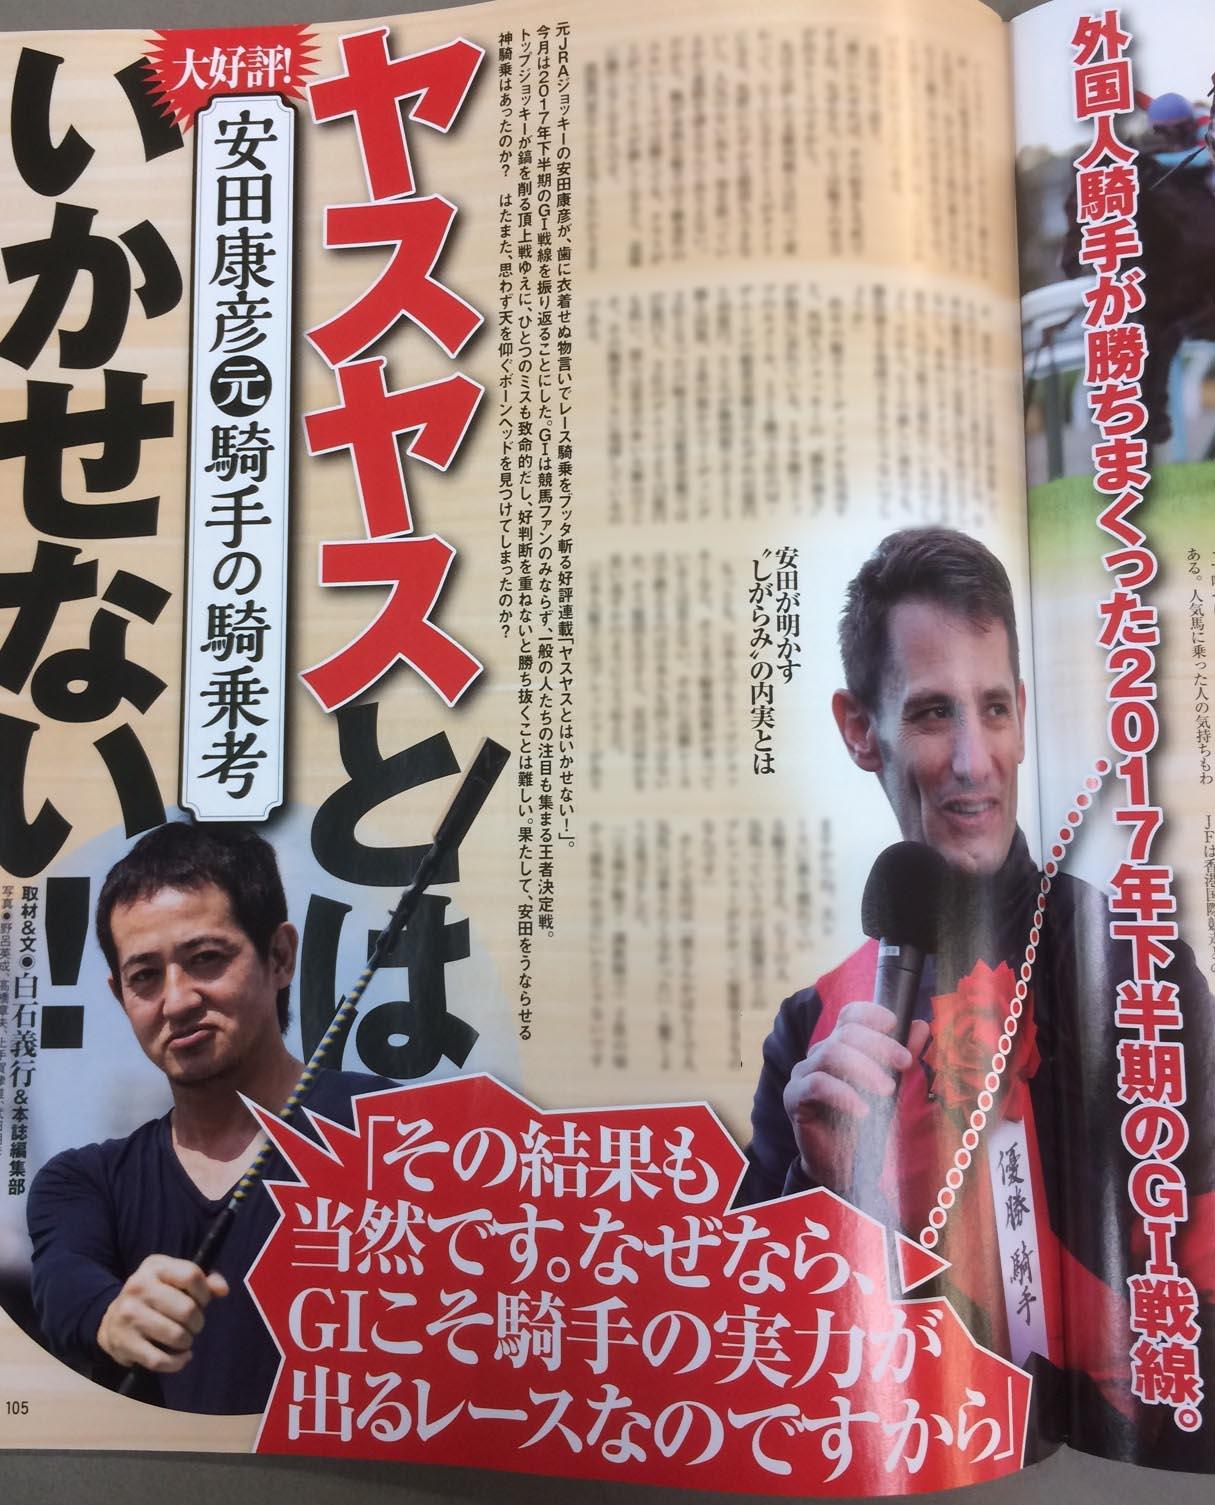 "競馬 最強の法則 Twitter પર: ""【3月号本日発売!】 元G1 ..."